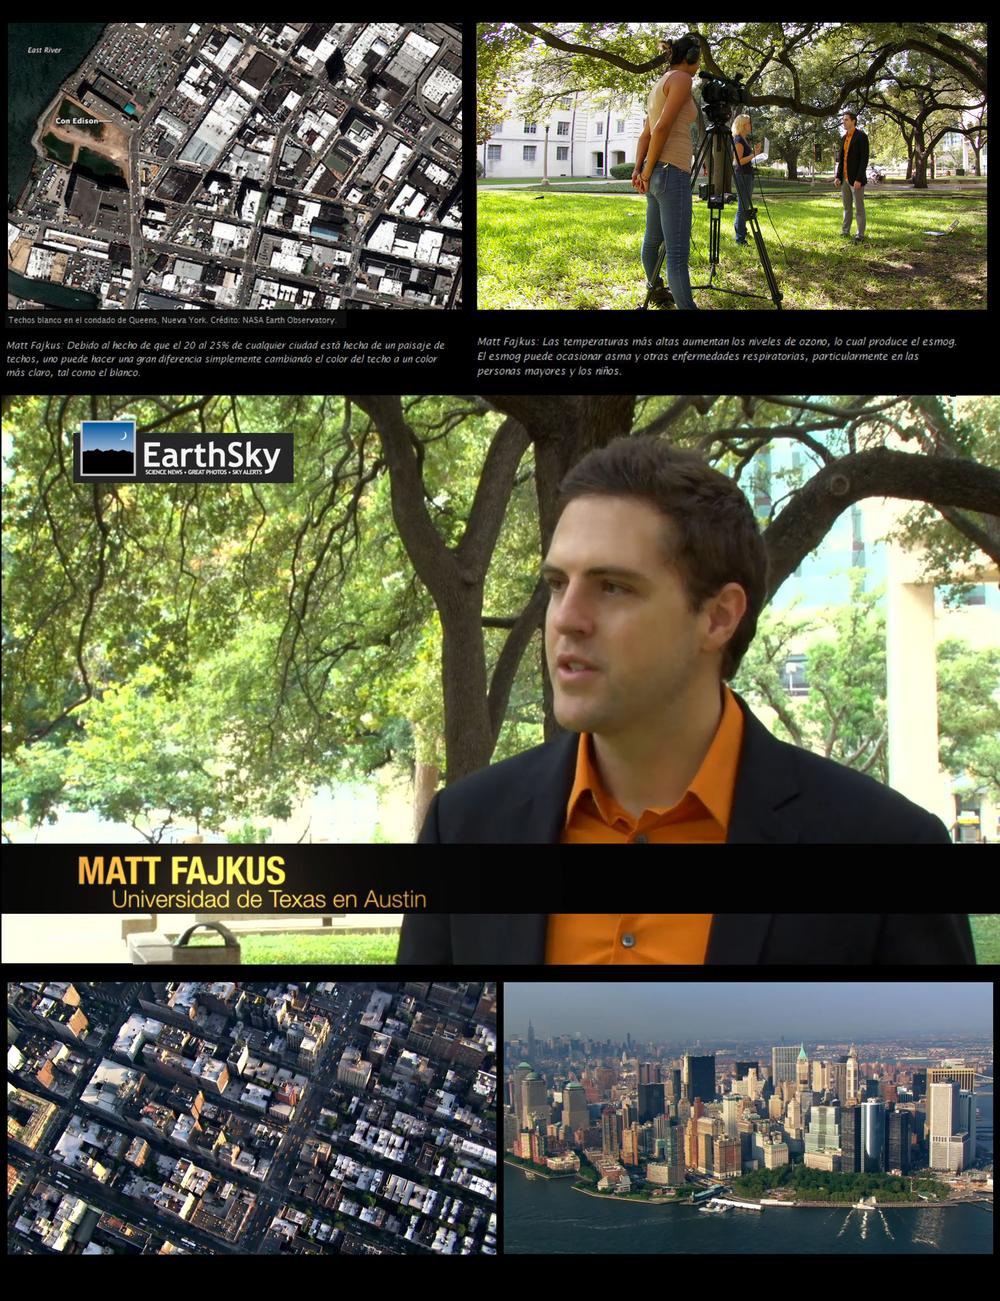 2013_1231 Matt Fajkus MF Architecture Earth Sky Spread1.jpg